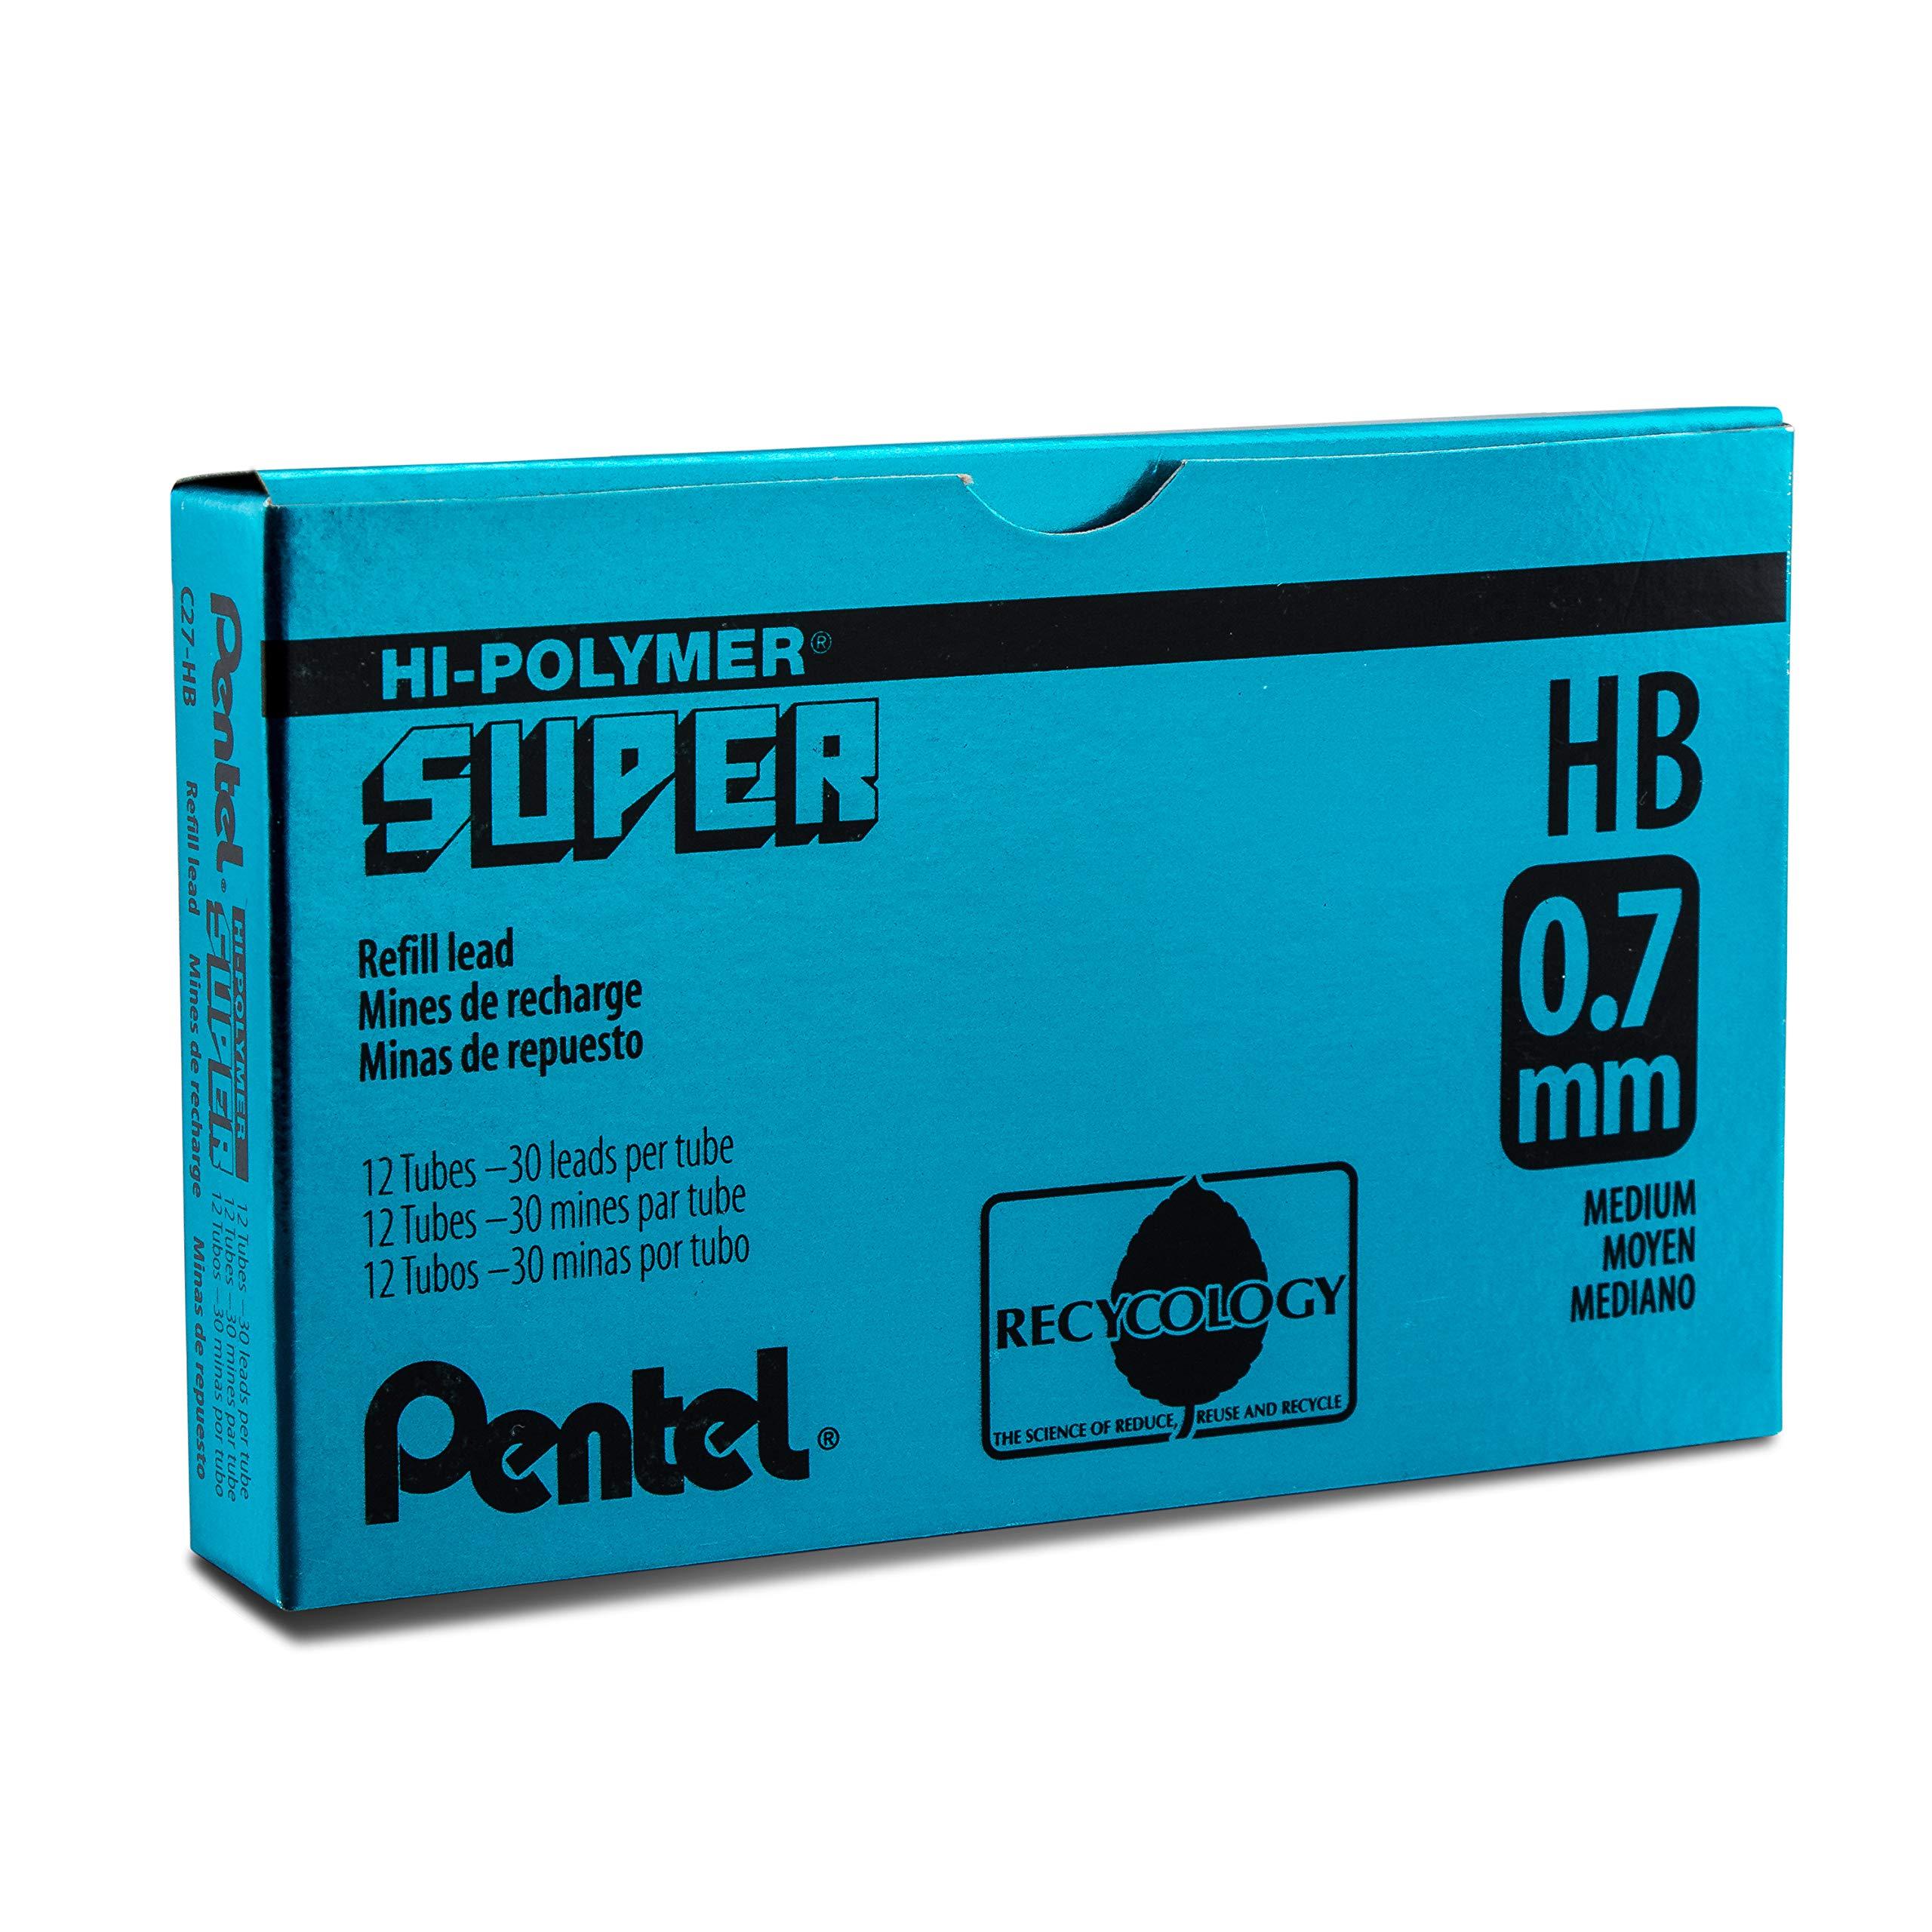 Pentel Super Hi-Polymer Lead Refill, 0.7mm Medium, HB, 360 Pieces of Lead (C27-HB) by Pentel